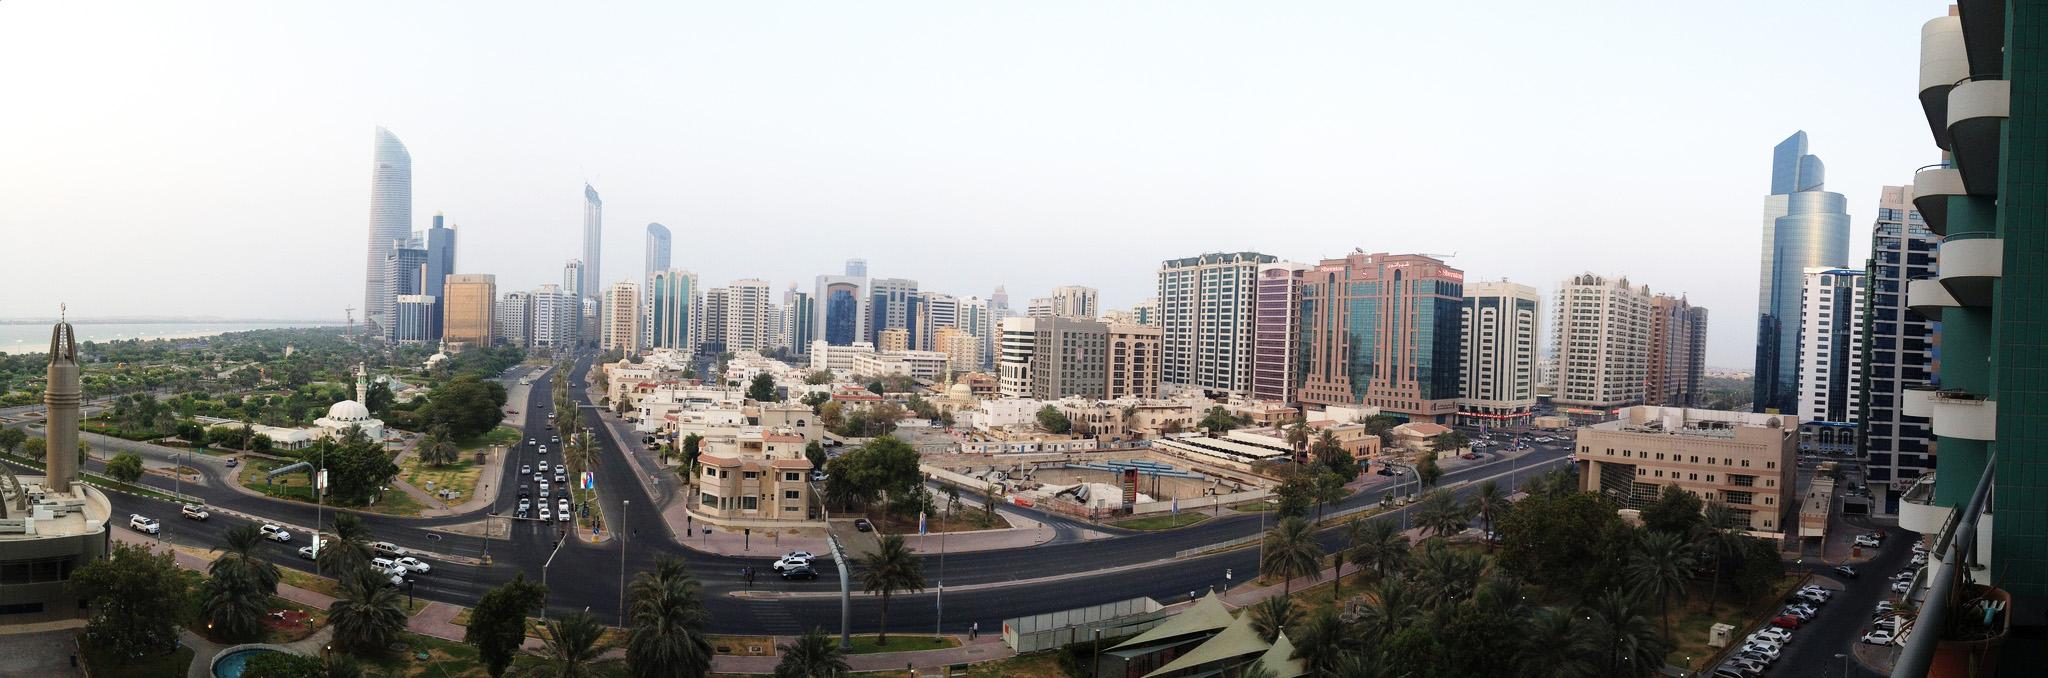 Достопримечательности Абу-Даби